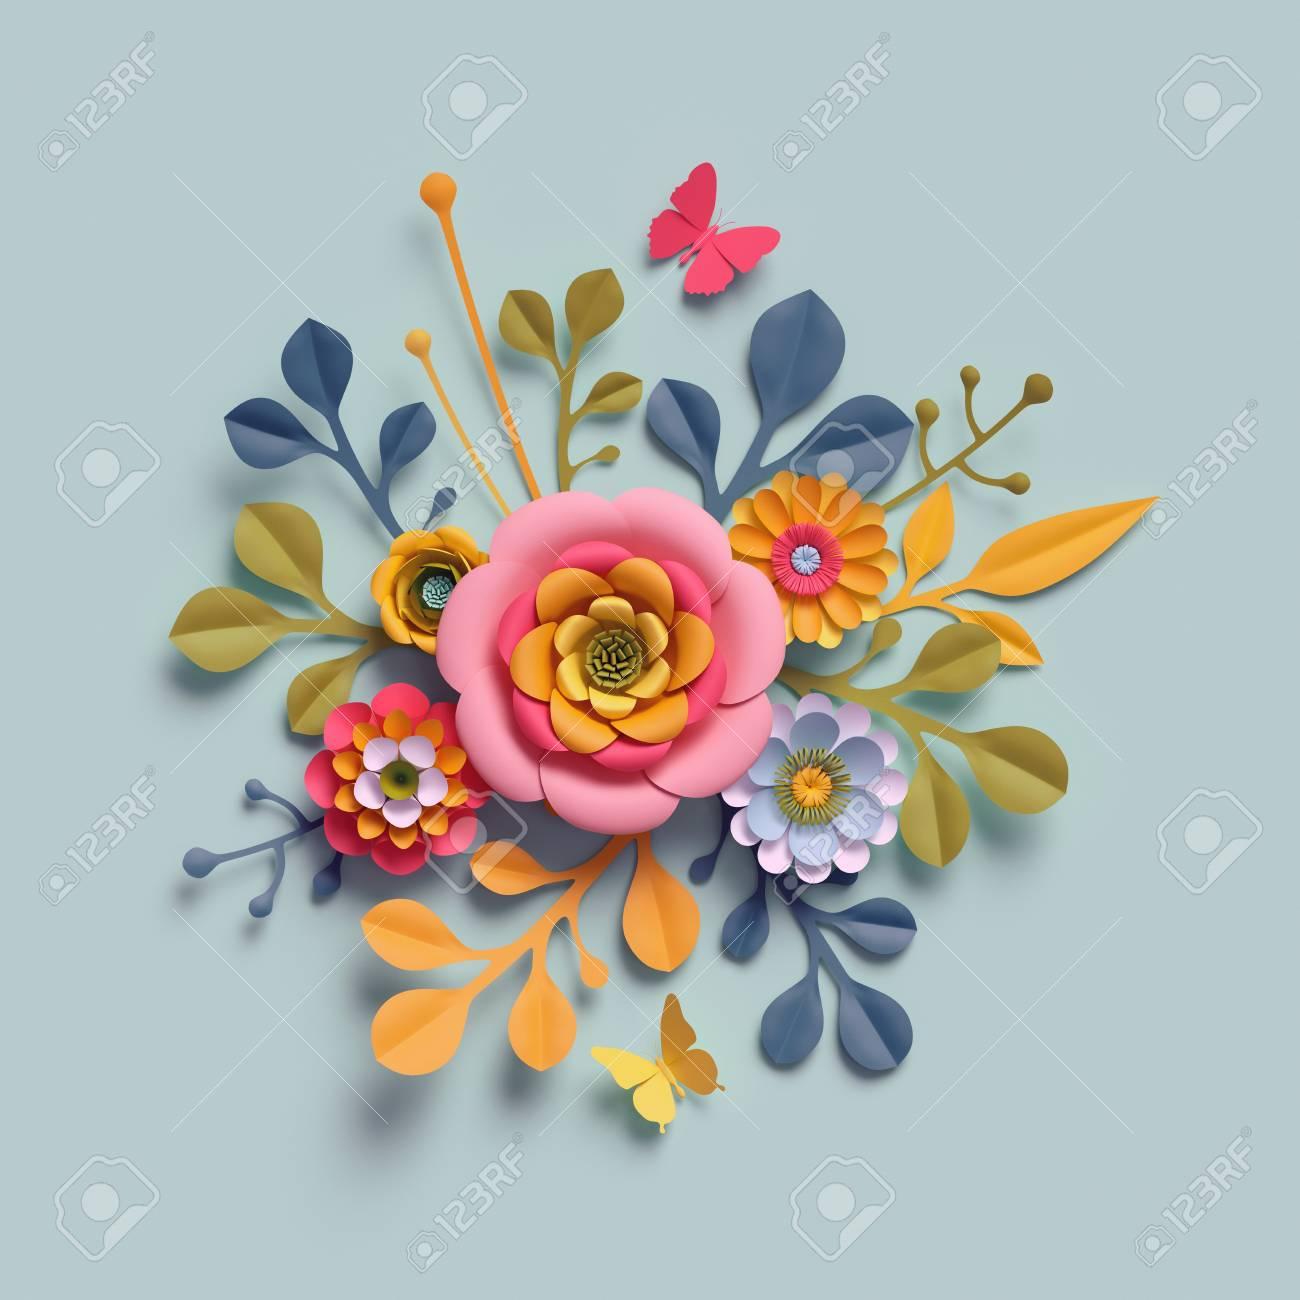 3d Render Craft Paper Flowers Autumn Botanical Arrangement